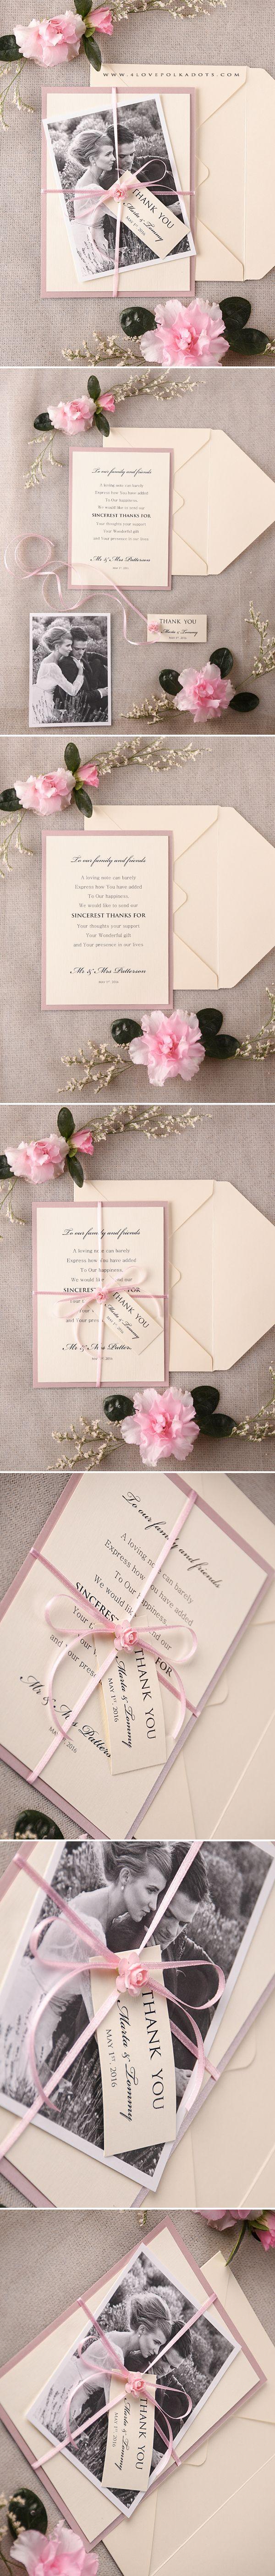 Wedding Thank You Card with Your Photo #weddingideas #pink #cream #summerwedding